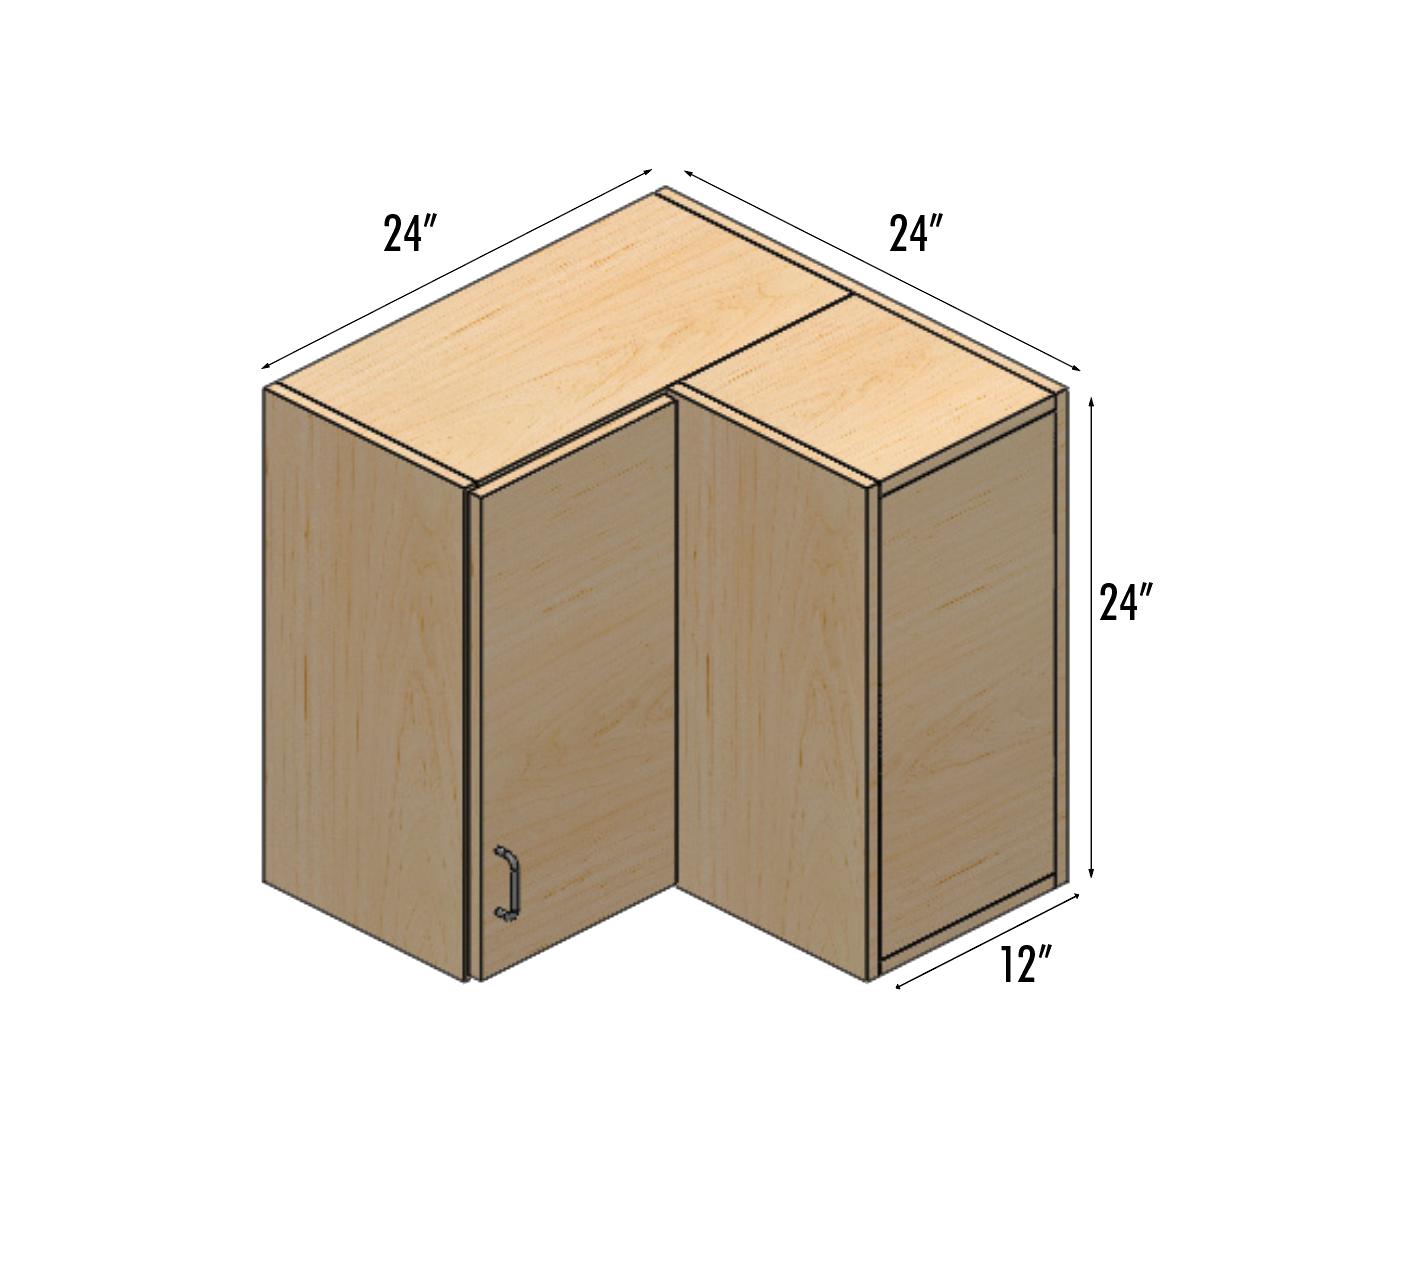 SEMCW-004 Wall Cabinet